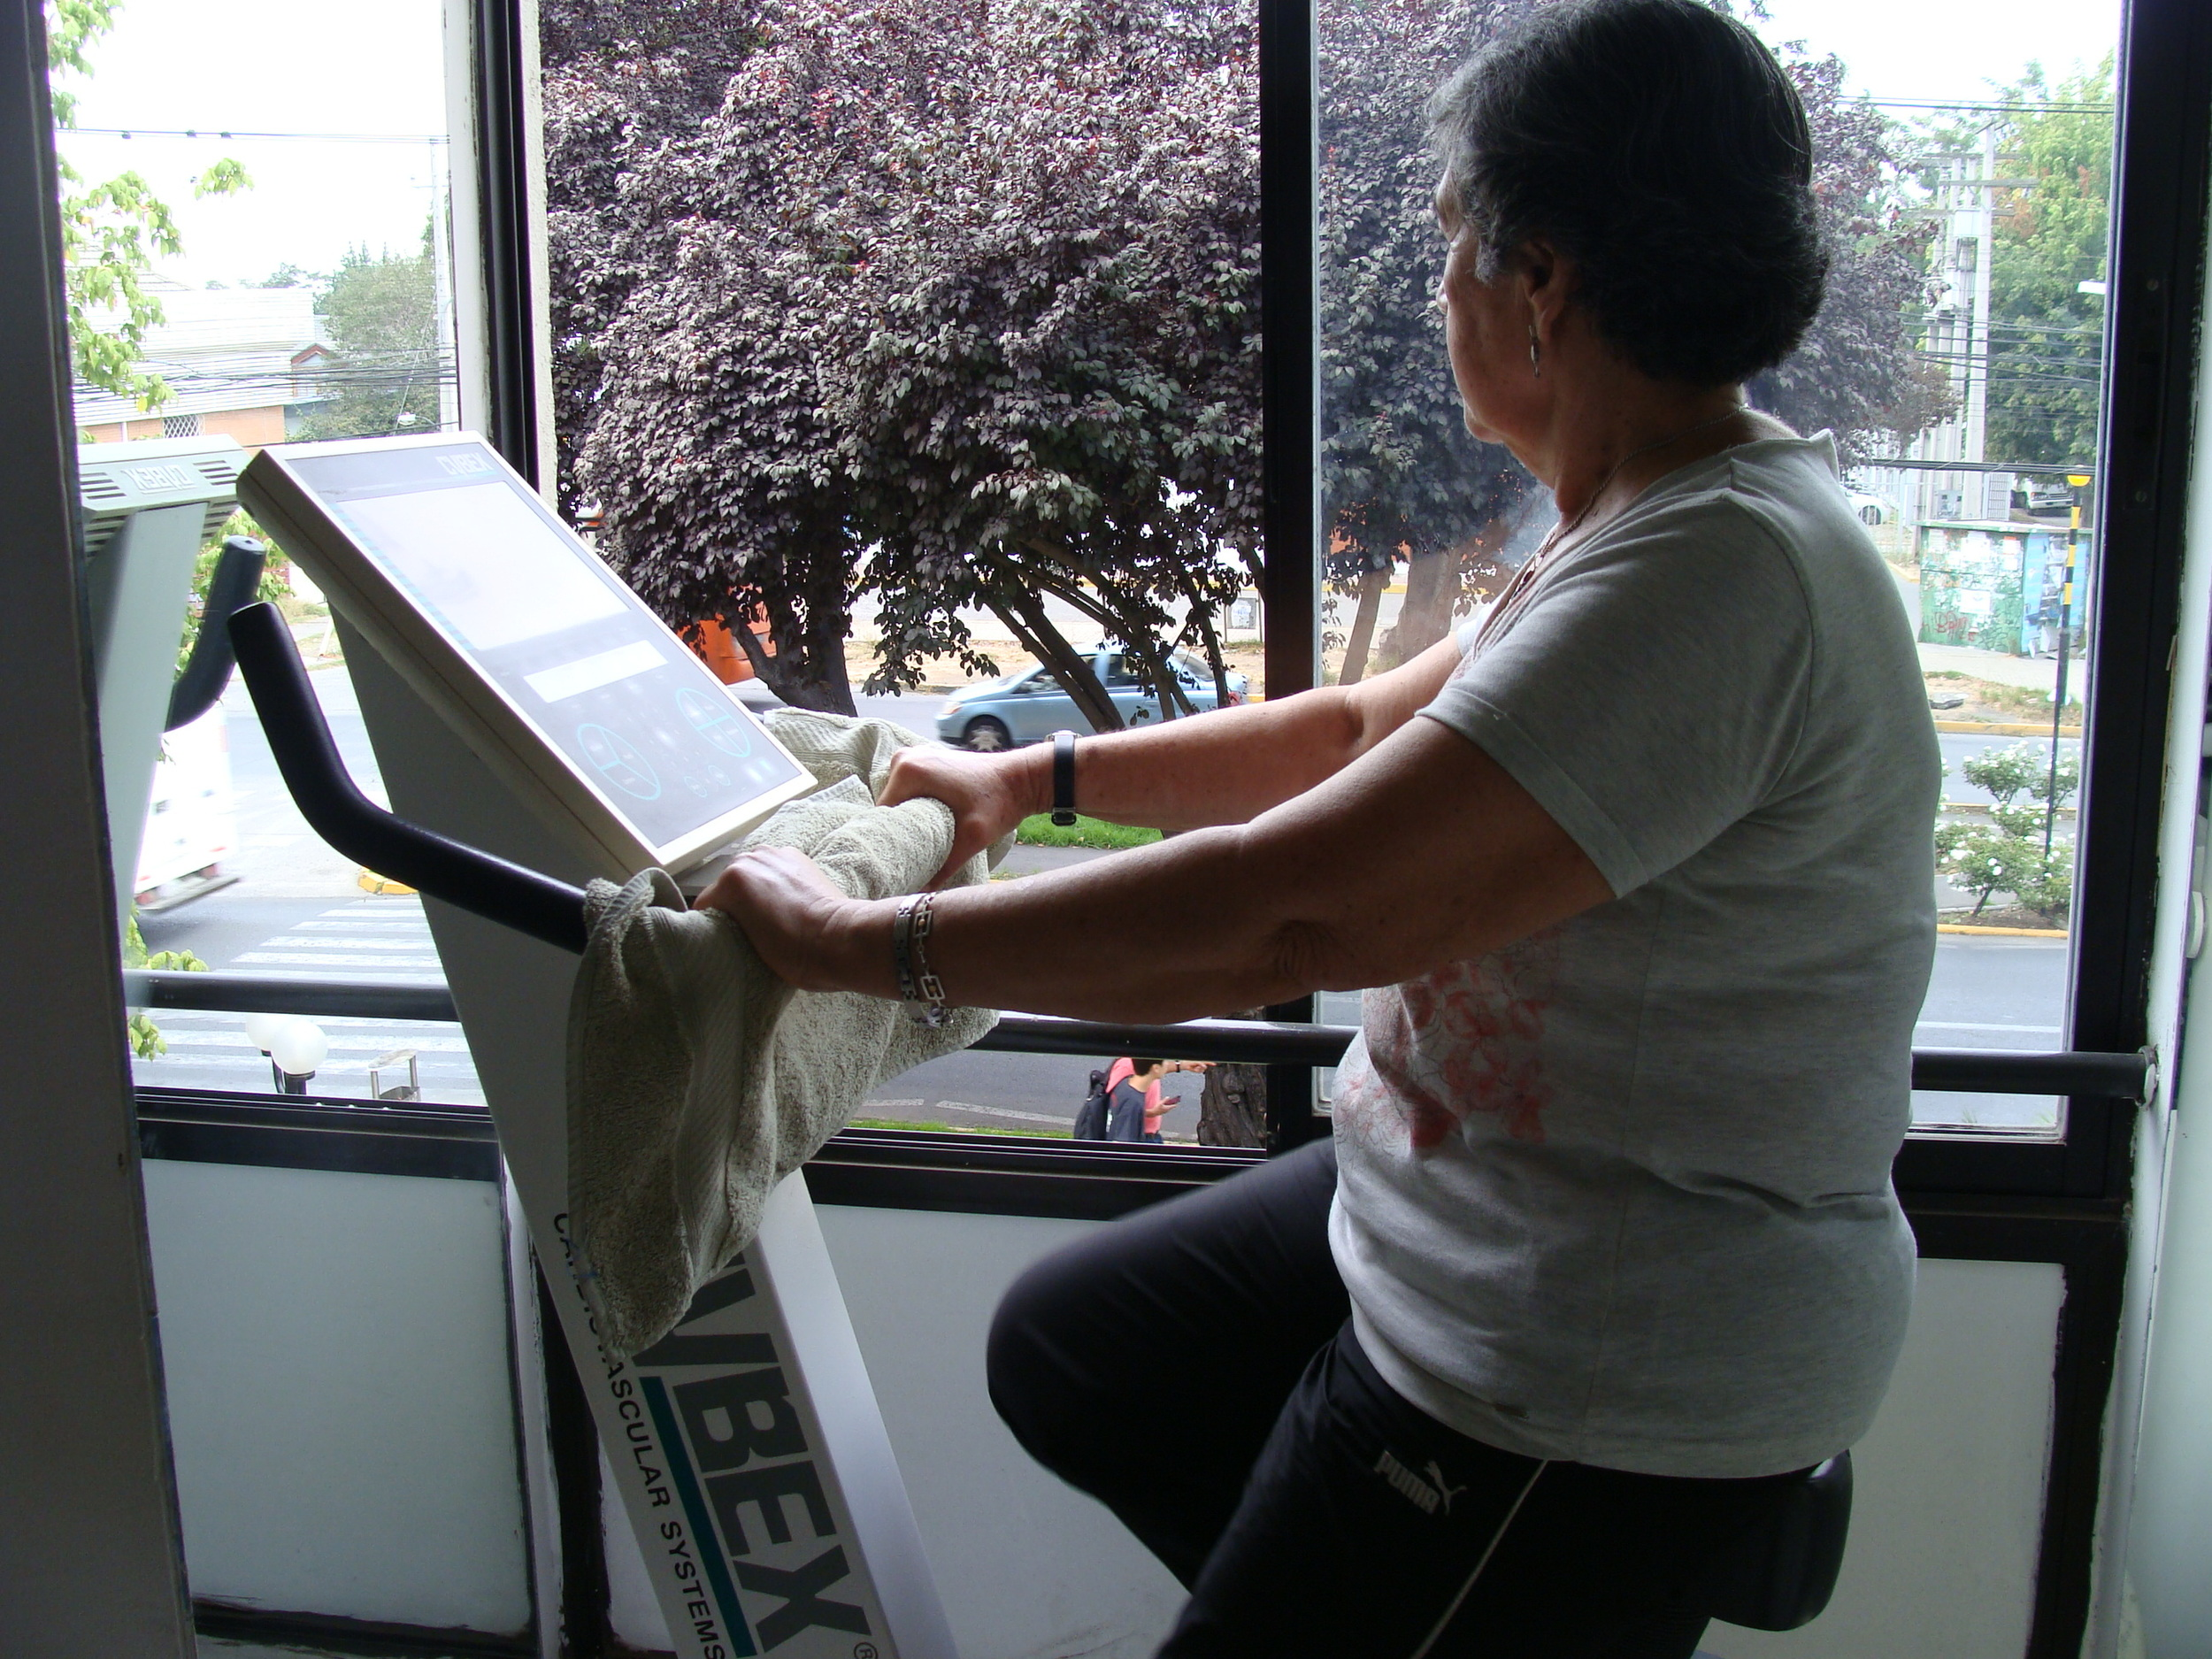 clinica de ejercicio kw - kinesiologia - bicicleta.JPG